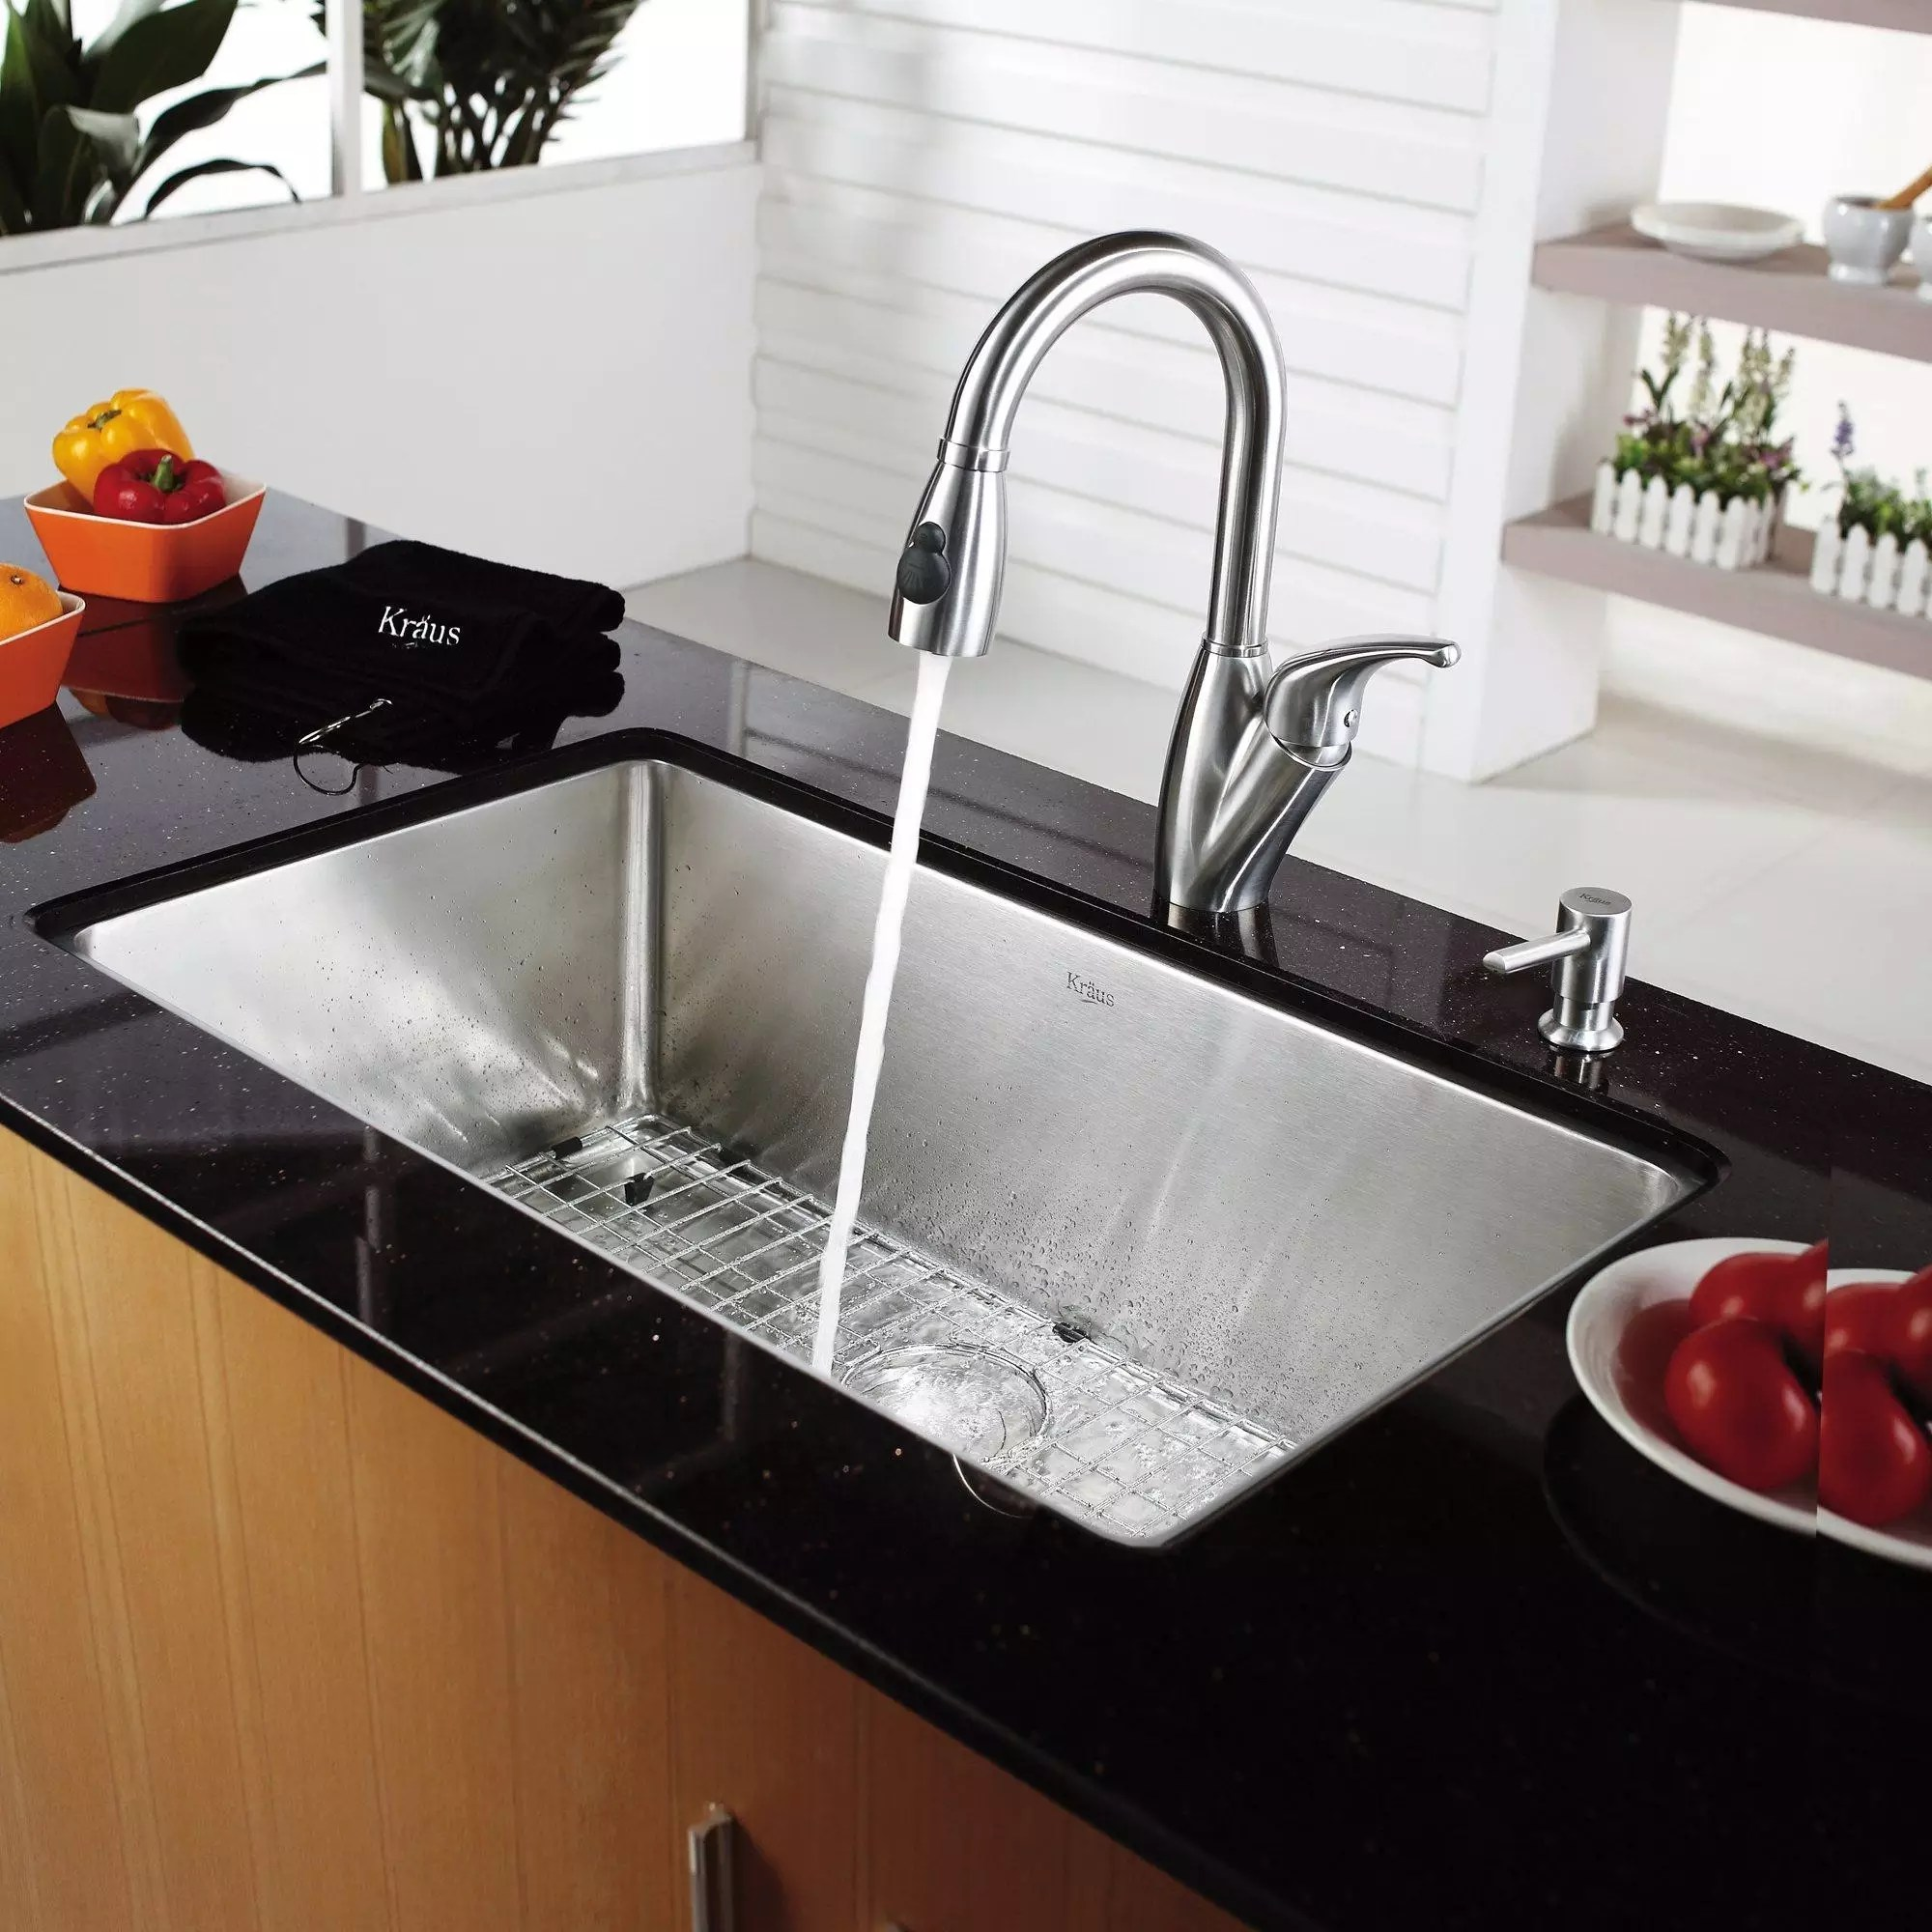 30 undermount kitchen sink ventilation system kraus khu10030kpf2121sd20 inch single bowl